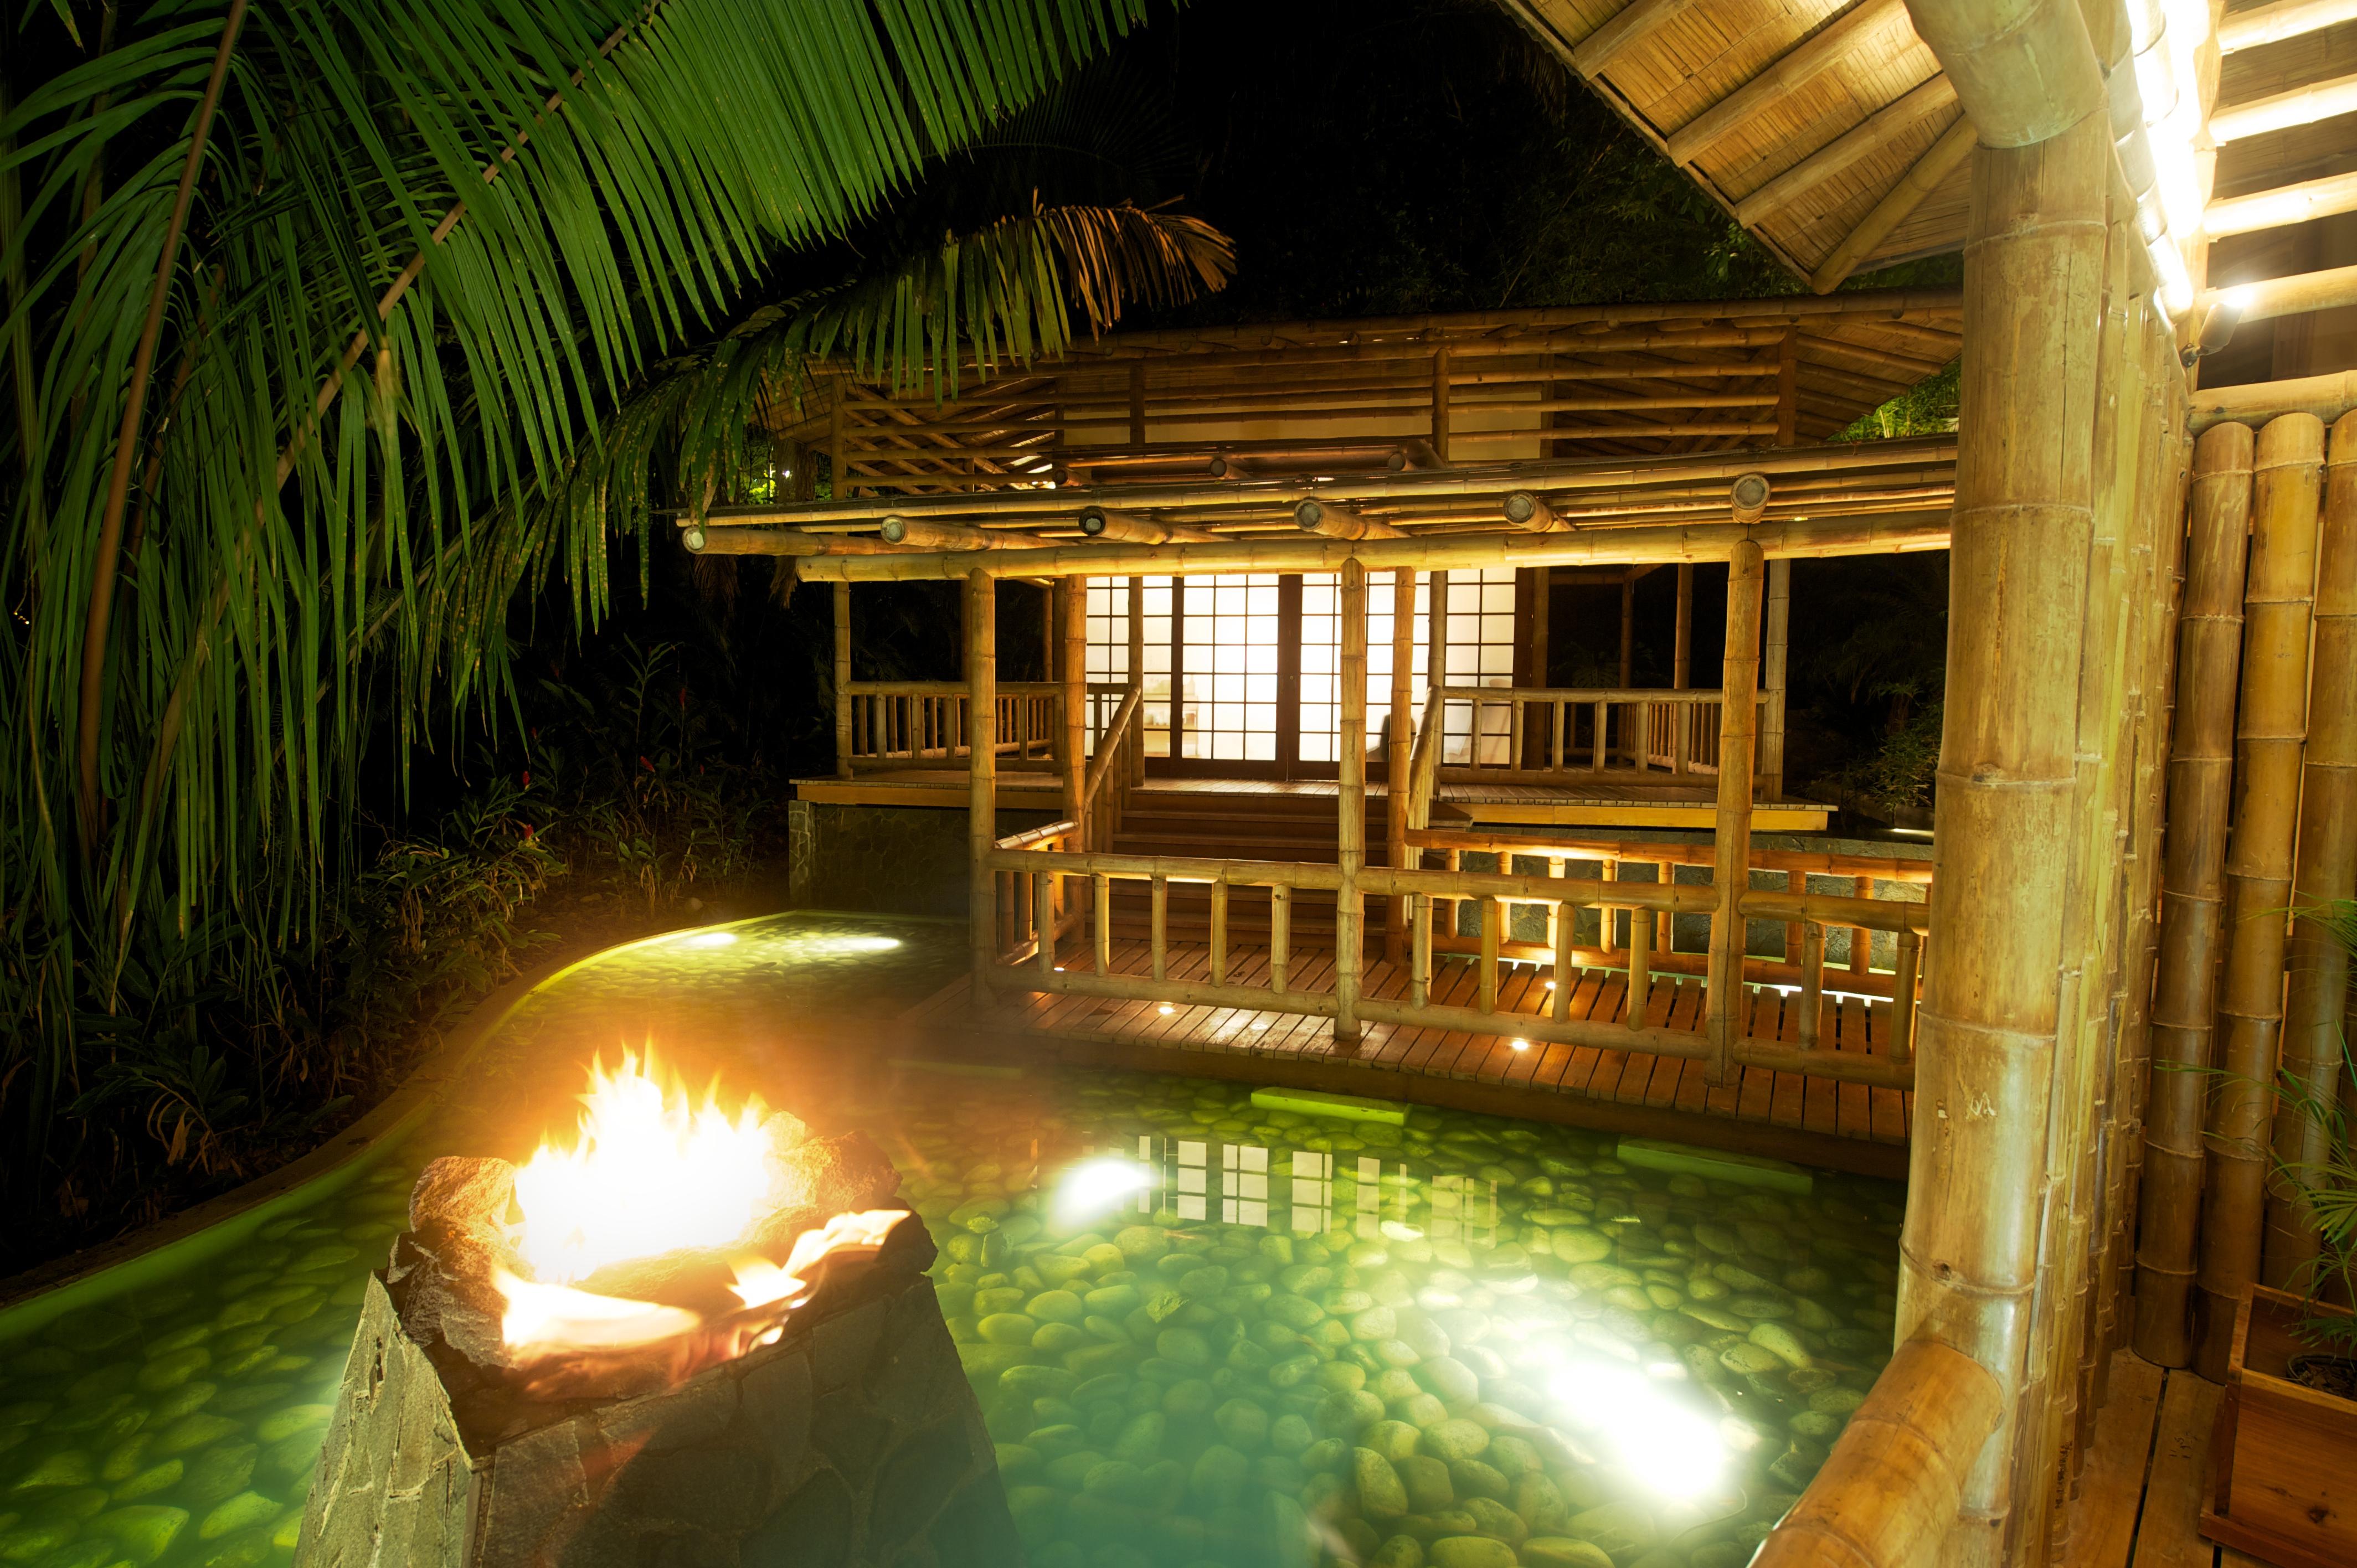 spa-bambu-architecture-florblanca-costa-rica